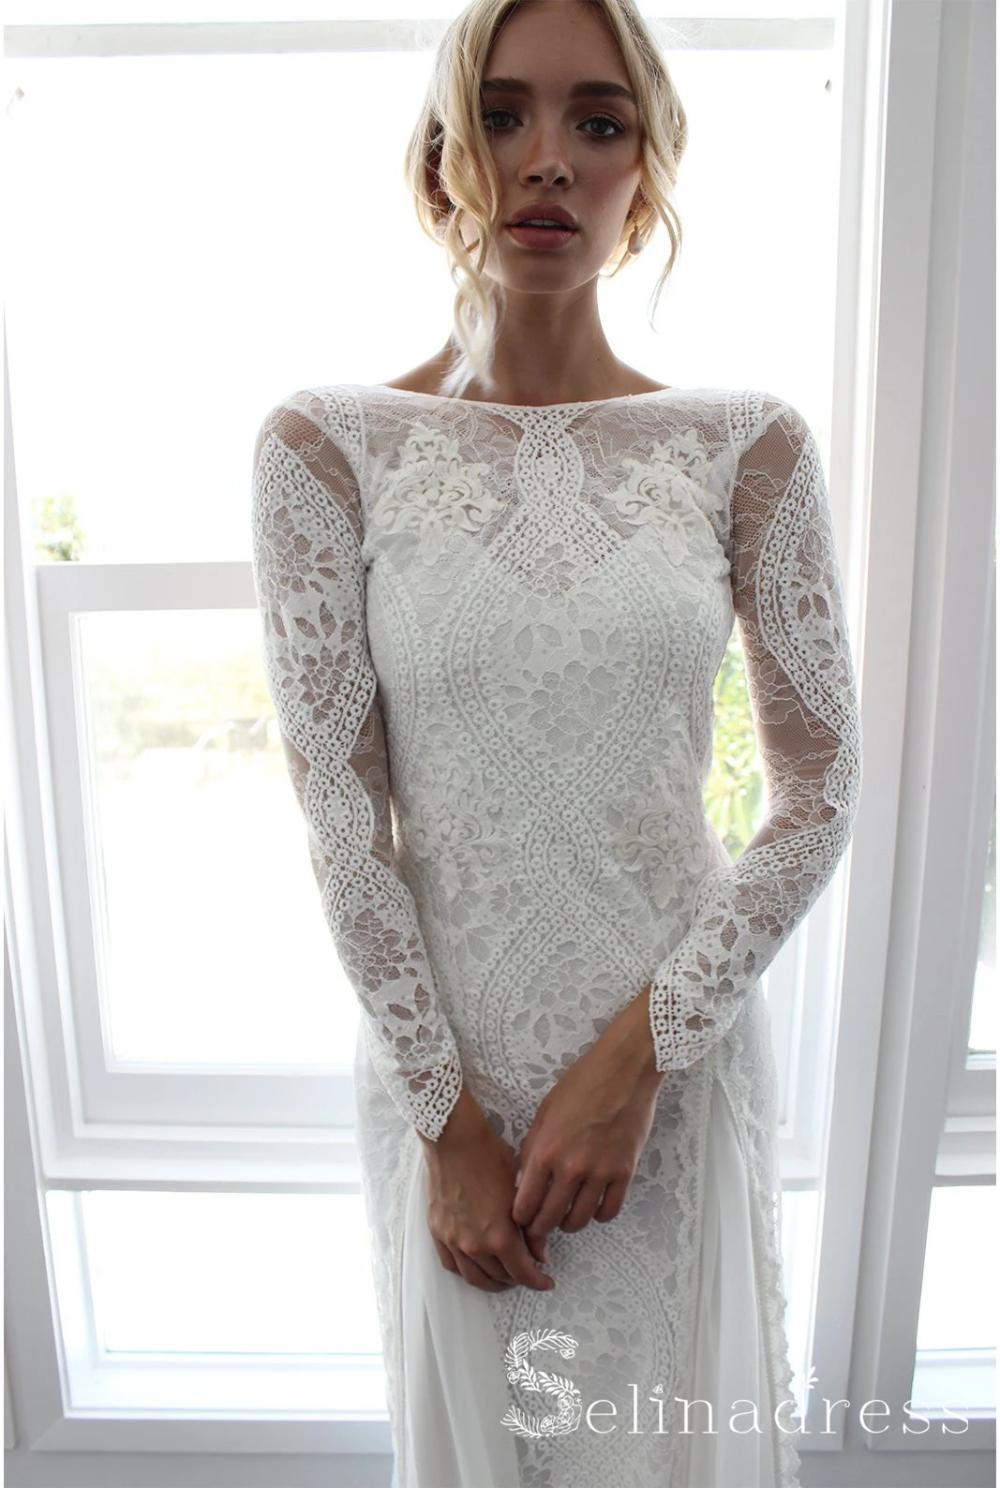 Open Back Sheath/Column Rustic Lace Wedding Dress Boho